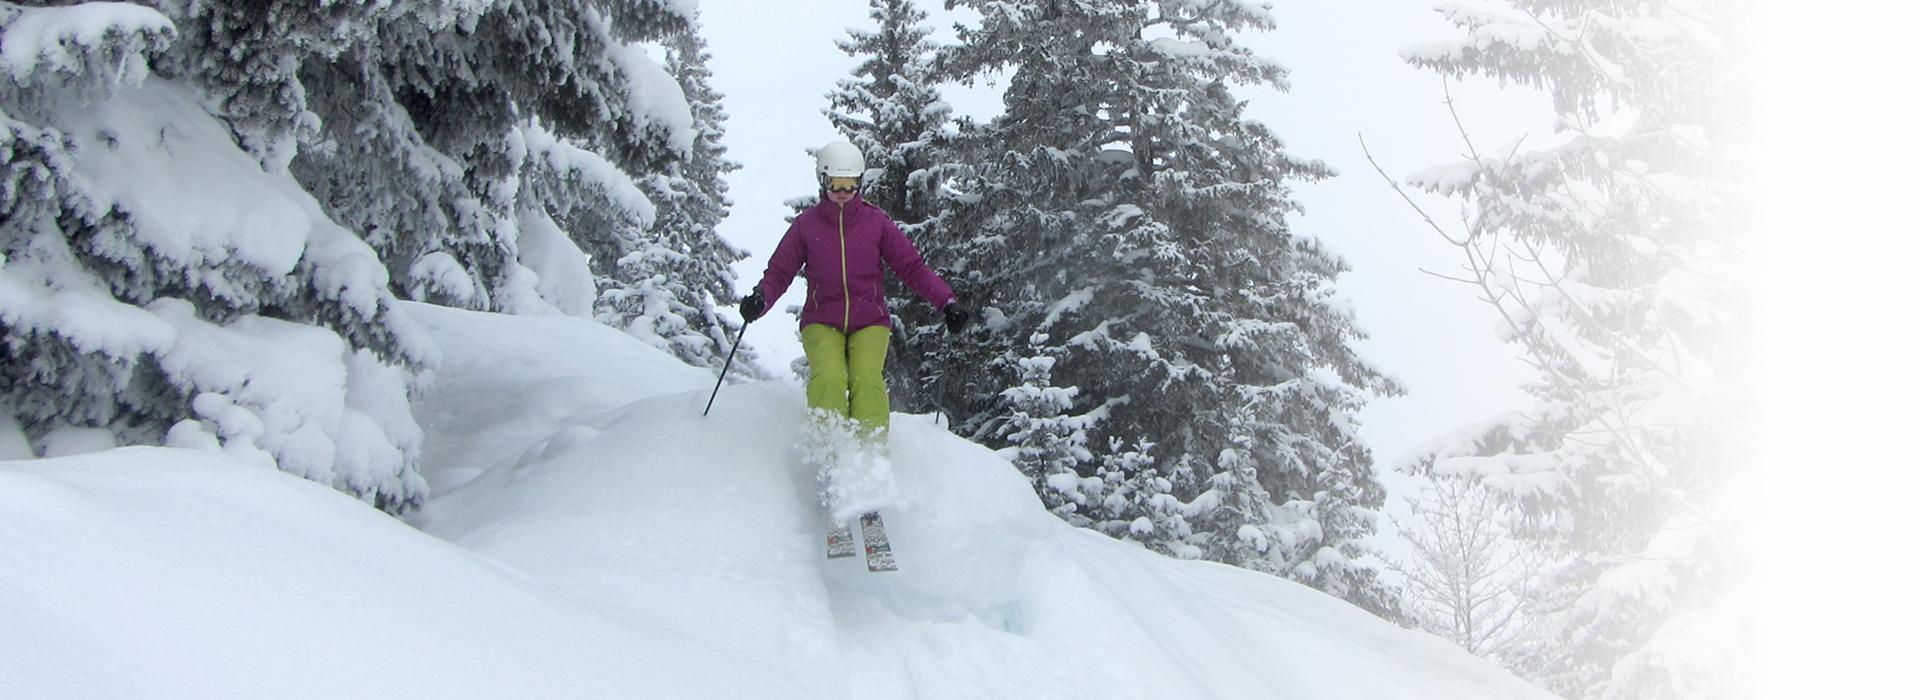 Delphine-skisession-ecole-de-ski-samoens